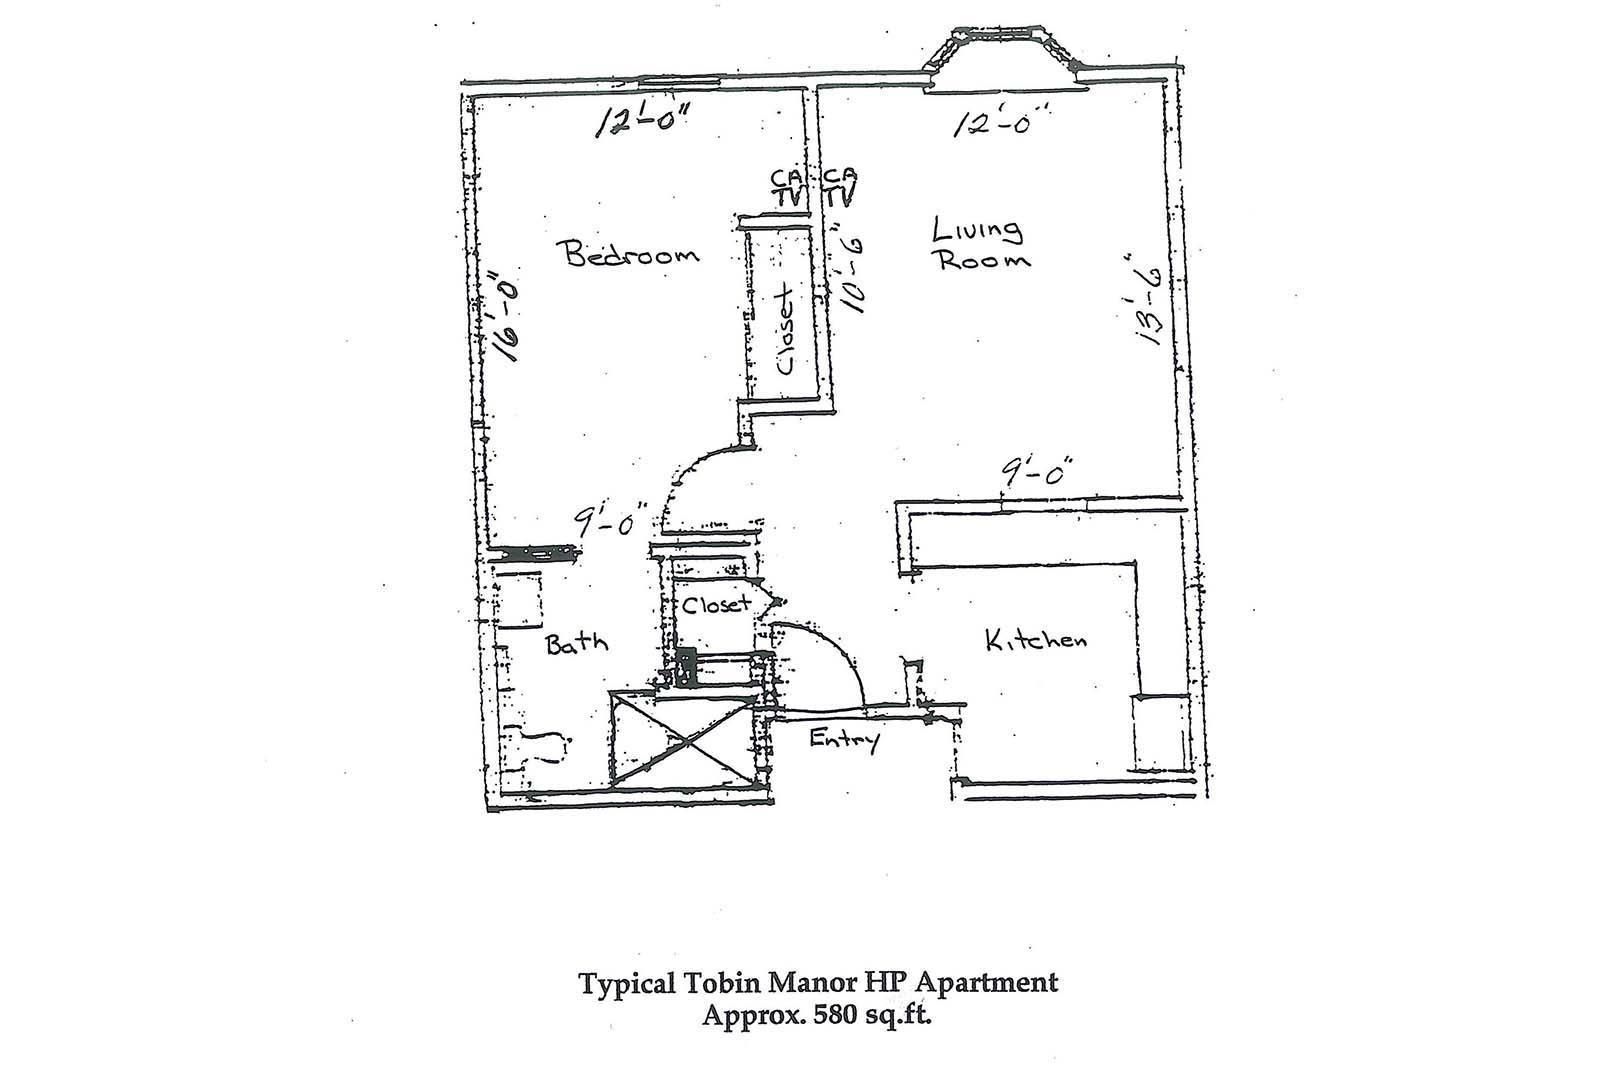 Tobin Manor 1 bR layout